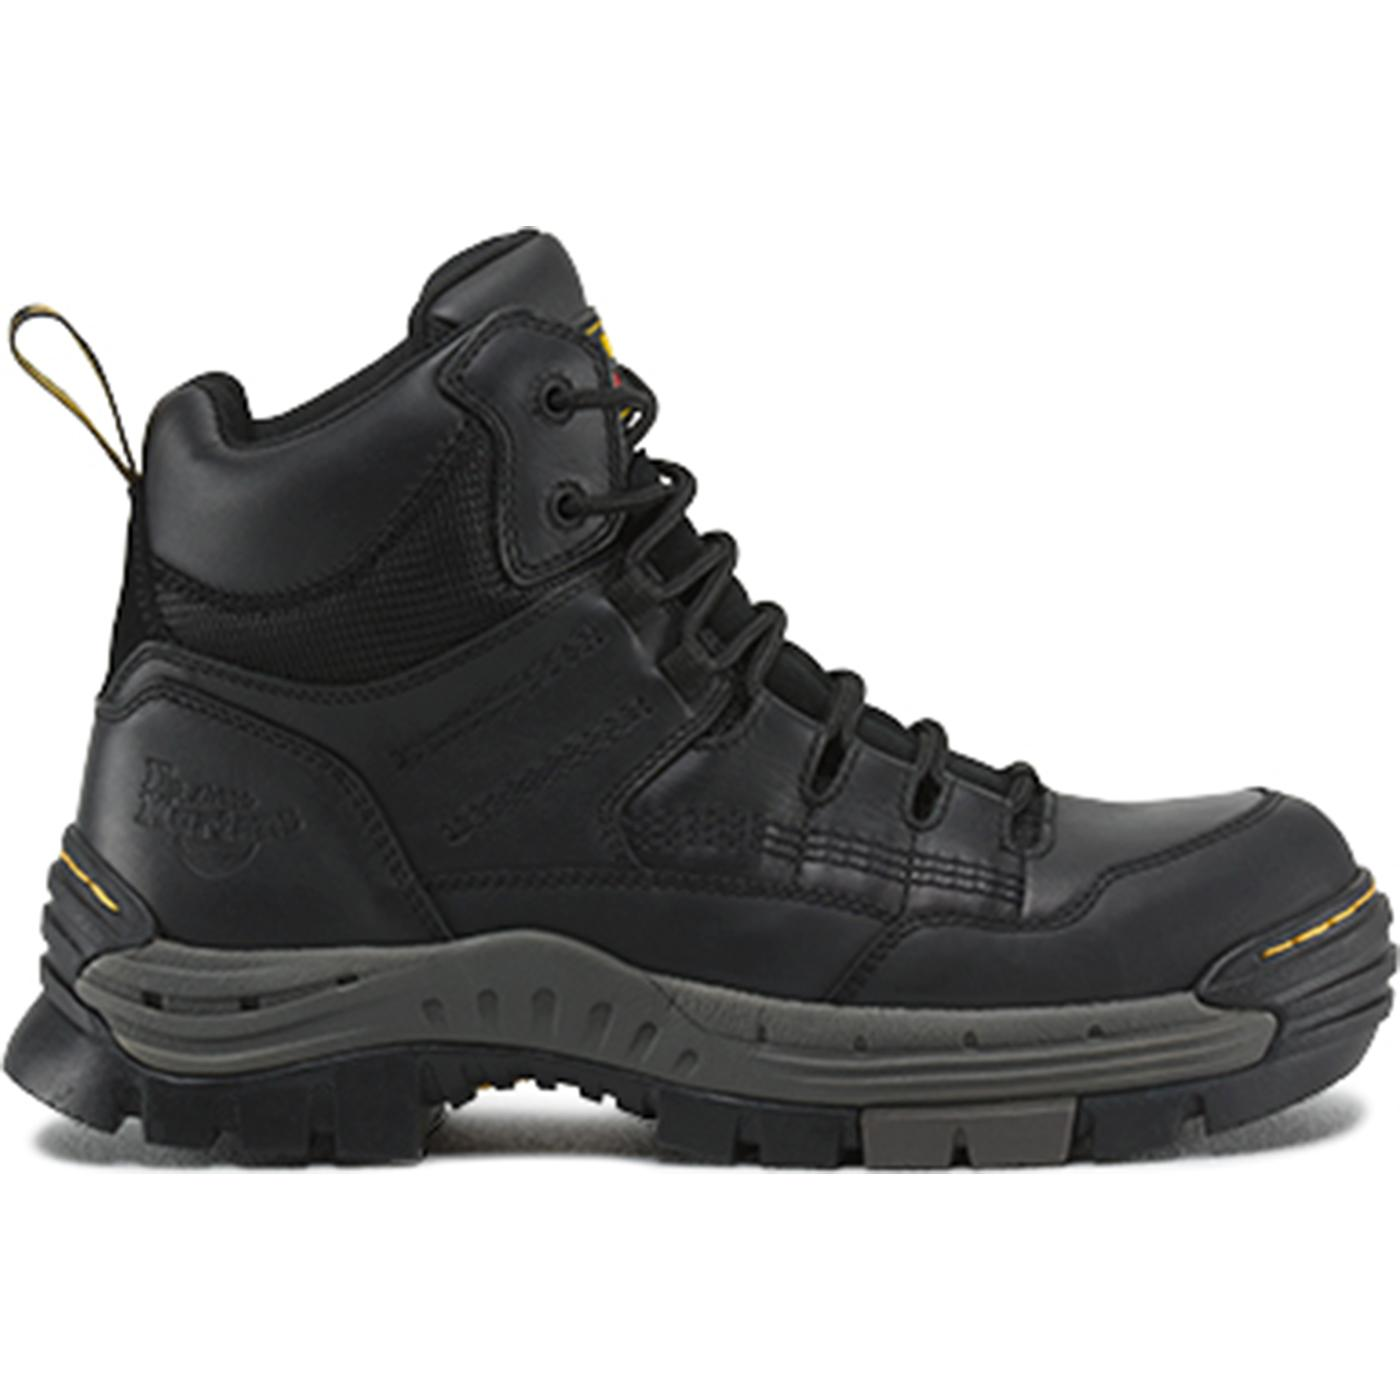 01e6ecc7036 Dr. Martens Truss Composite Toe Work Hiker